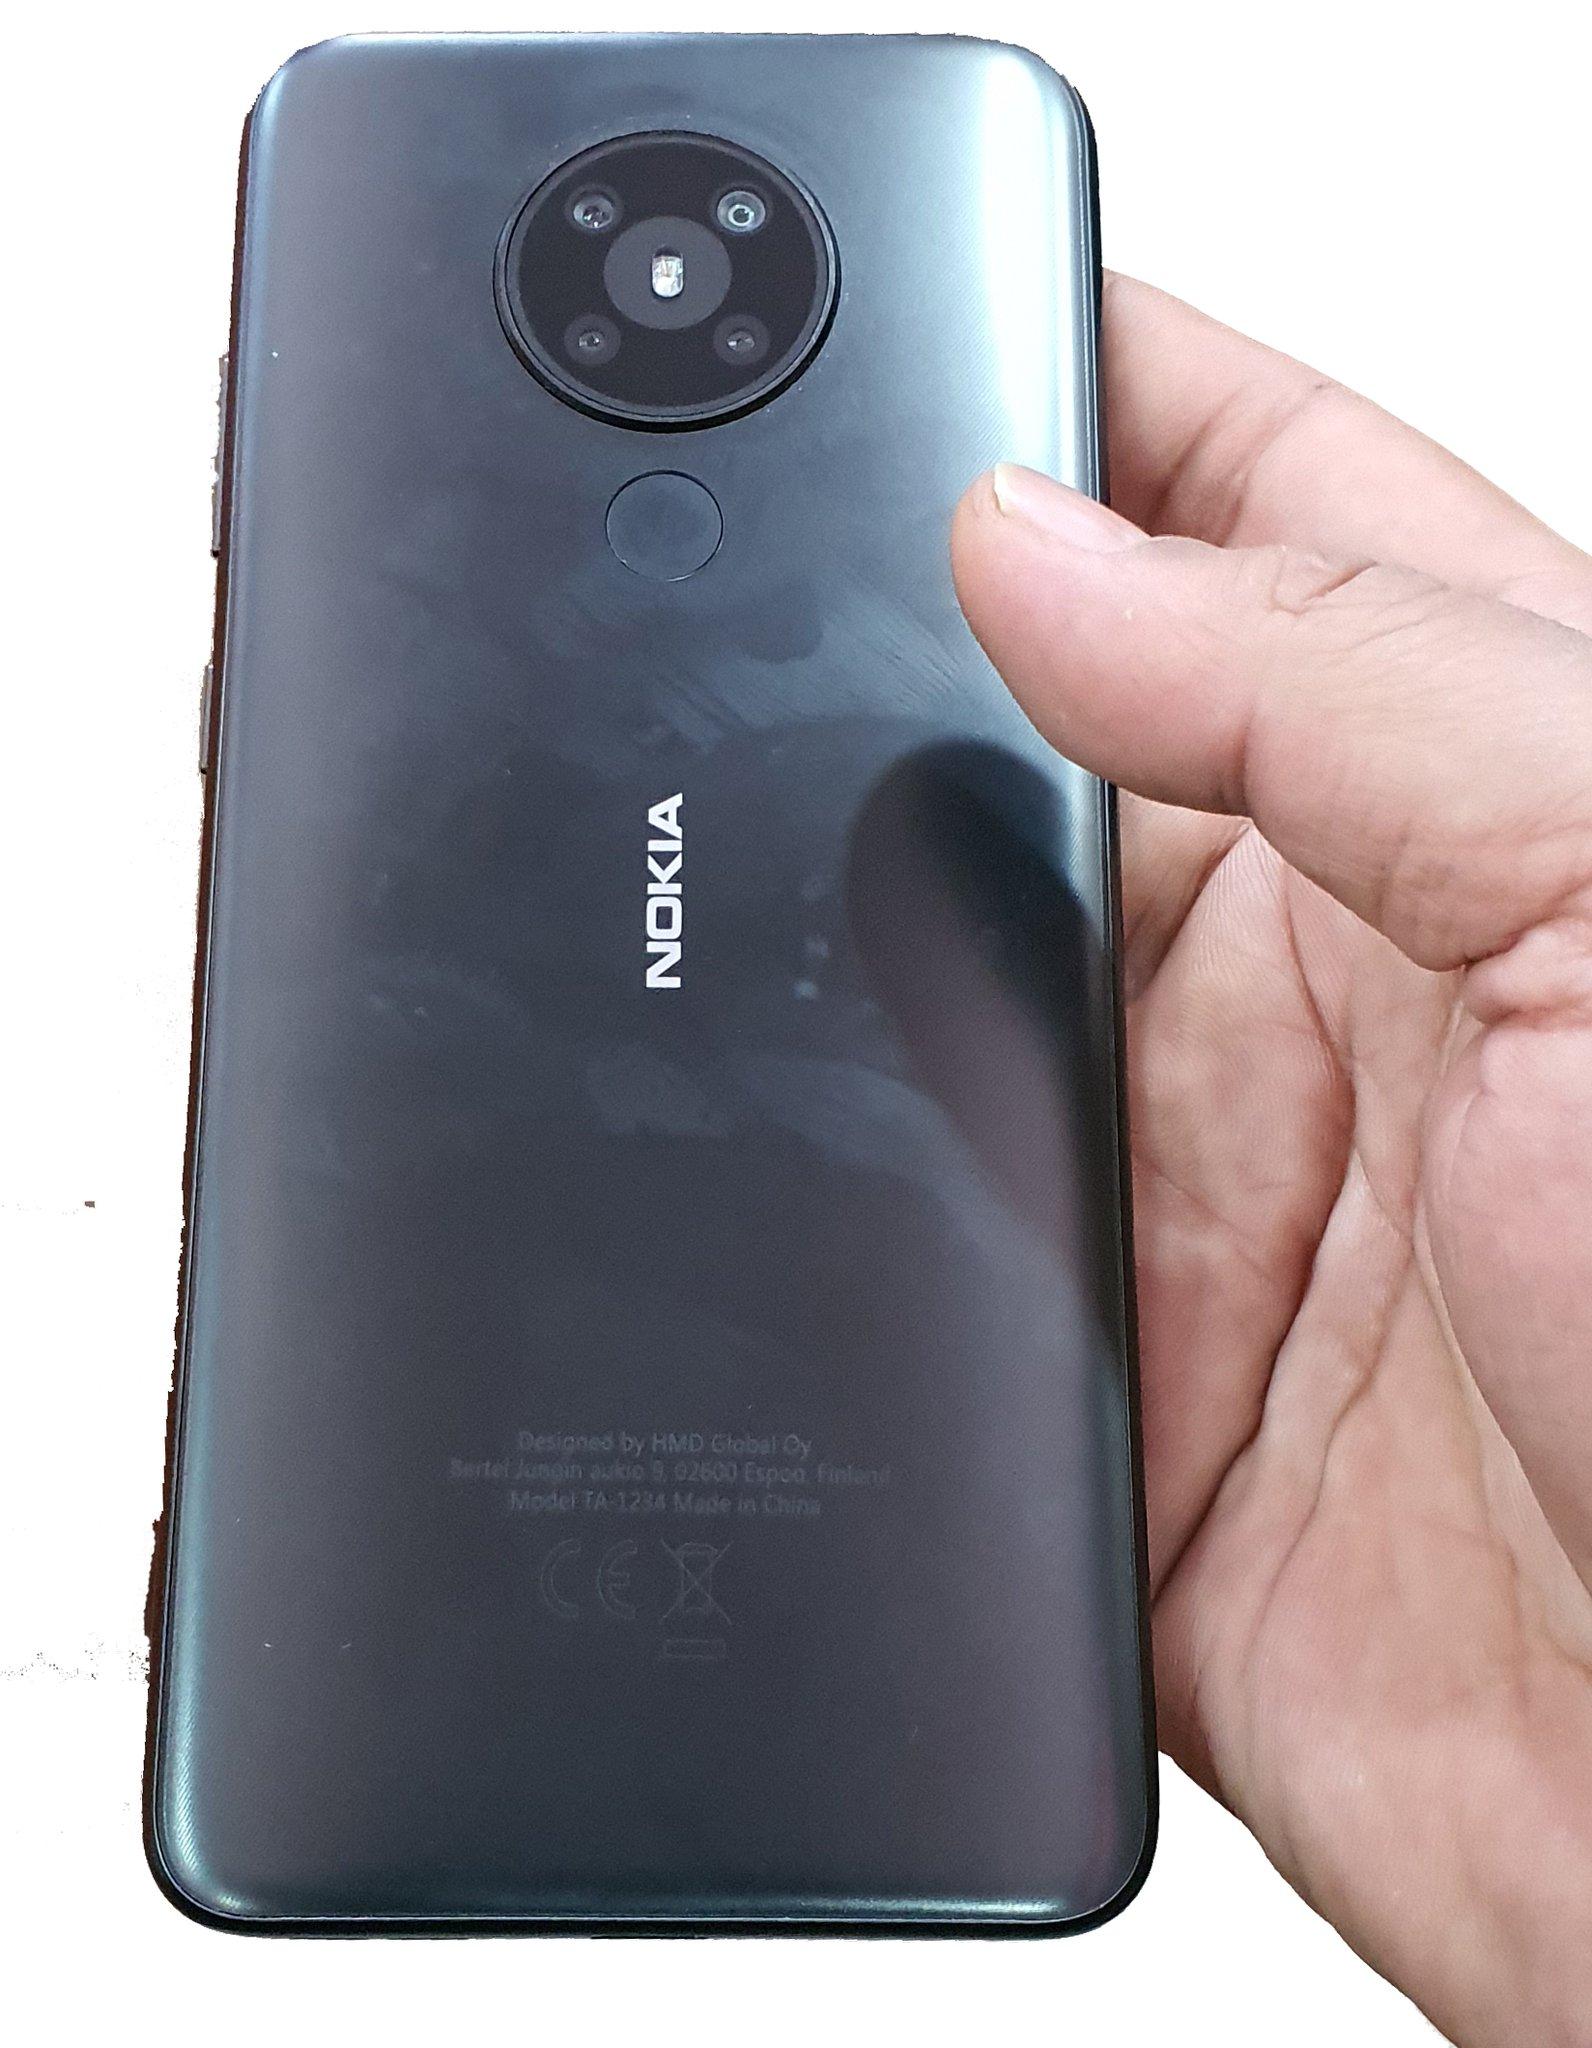 New Nokia phone with codename